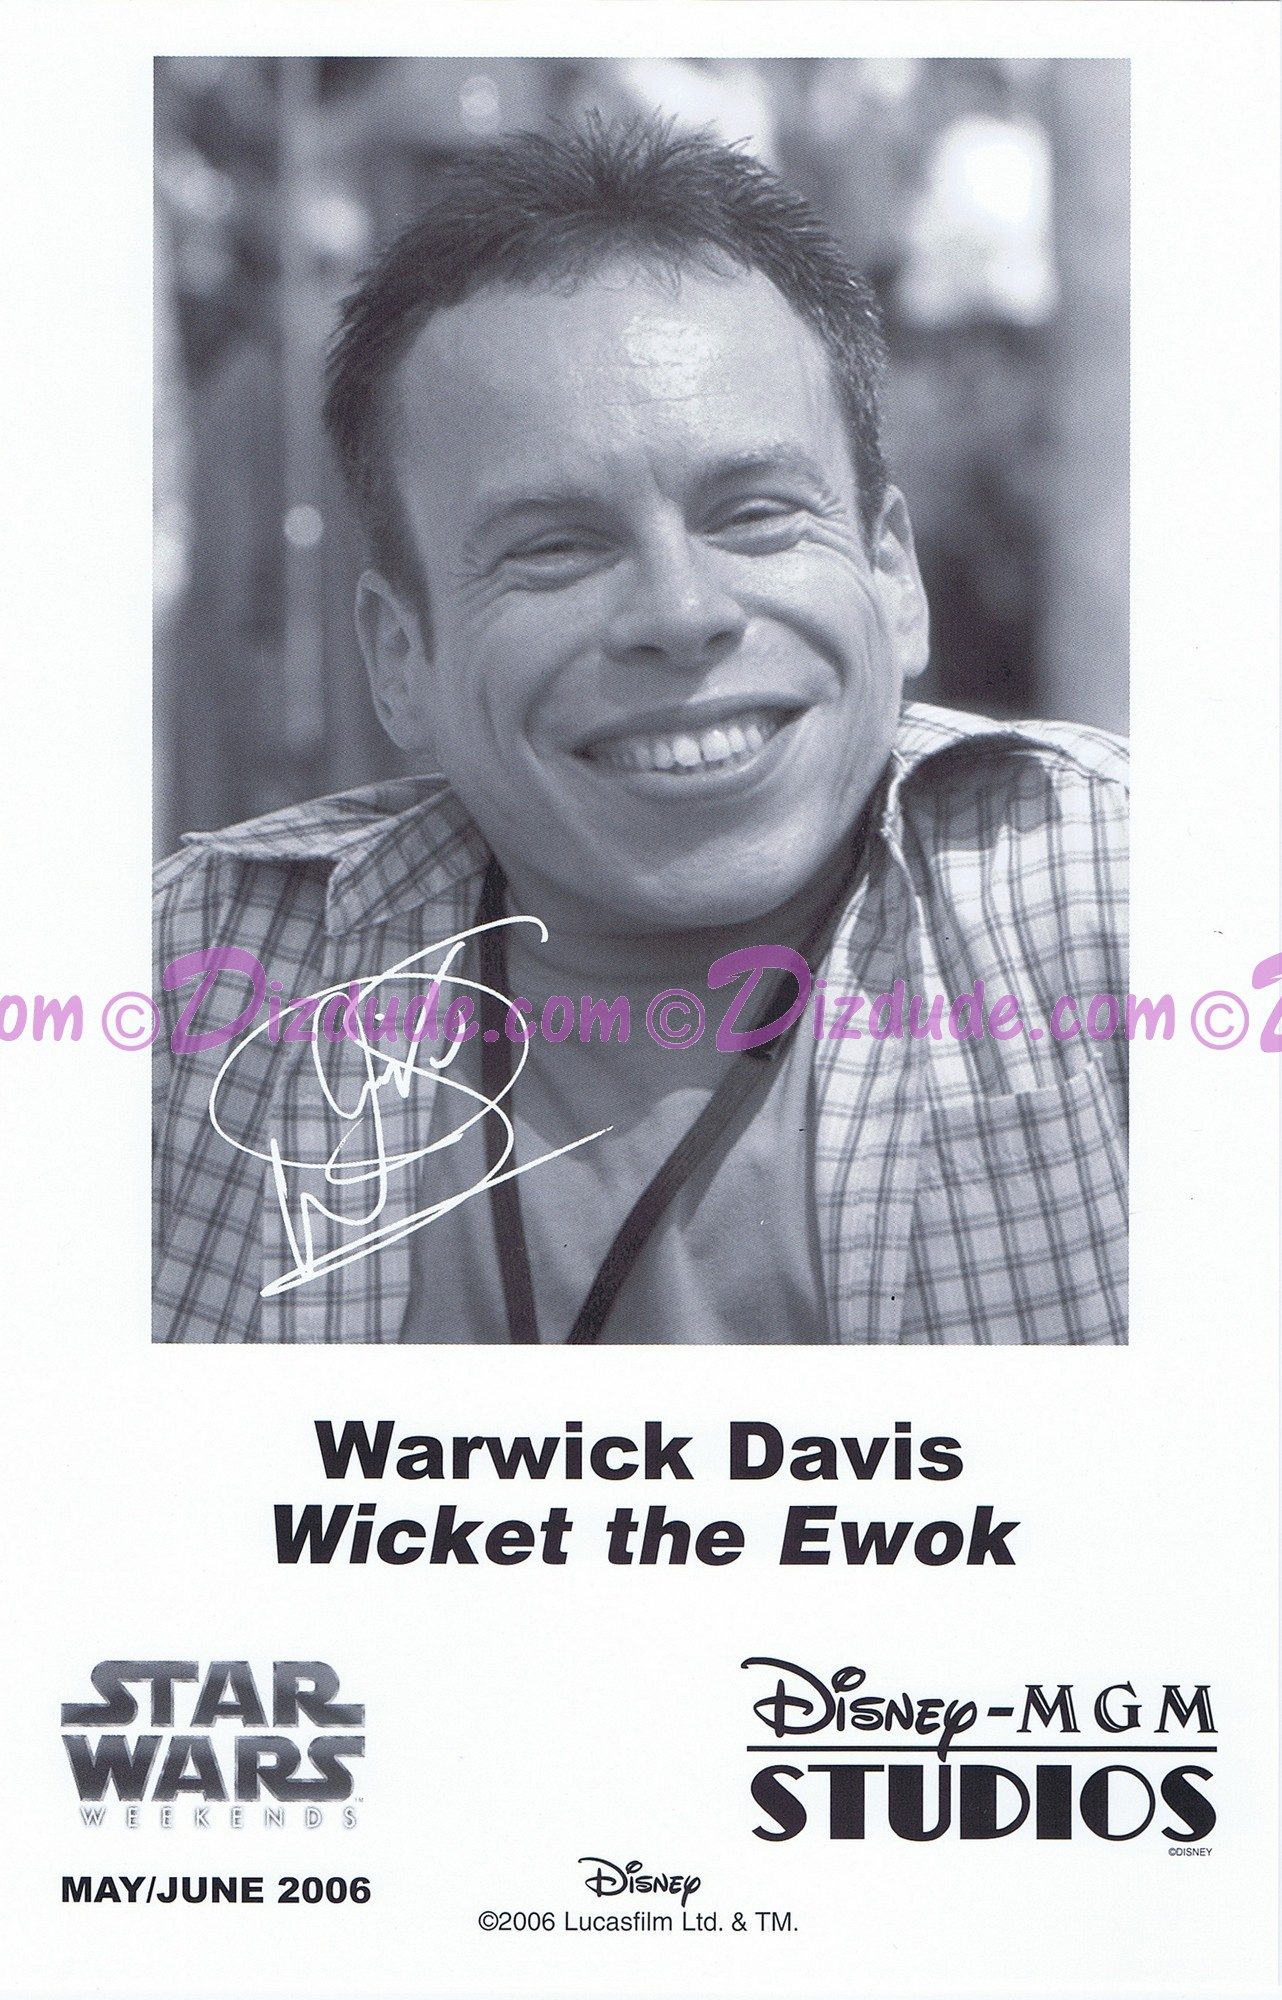 Warwick Davis who played The Ewok Wicket W. Warrick Presigned Official Star Wars Weekends 2006 Celebrity Collector Photo © Dizdude.com